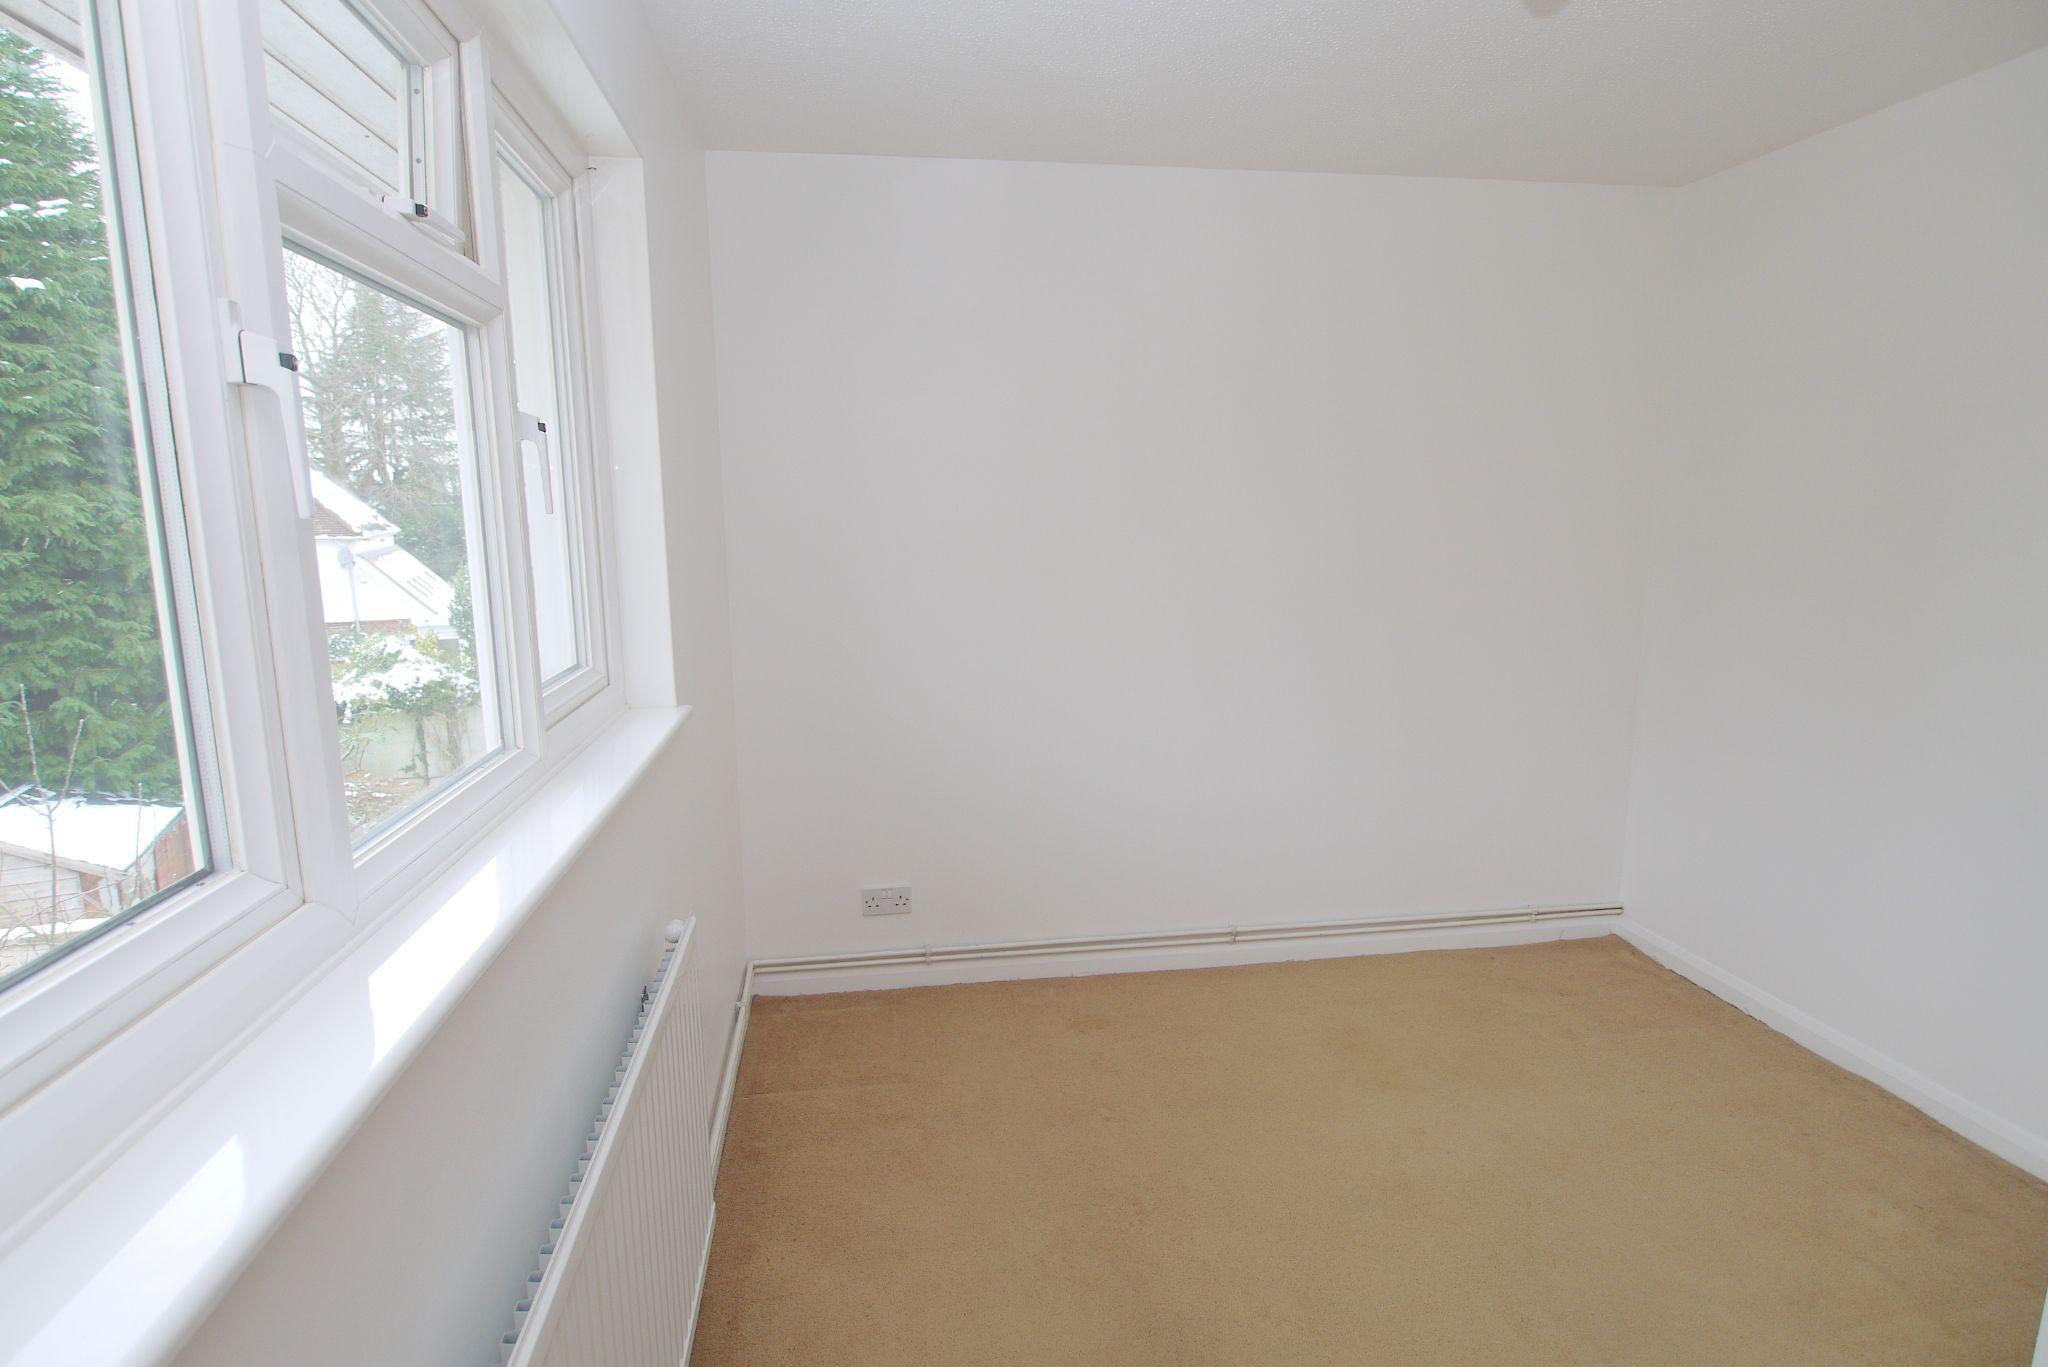 2 bedroom semi-detached house Sold in Sevenoaks - Photograph 5